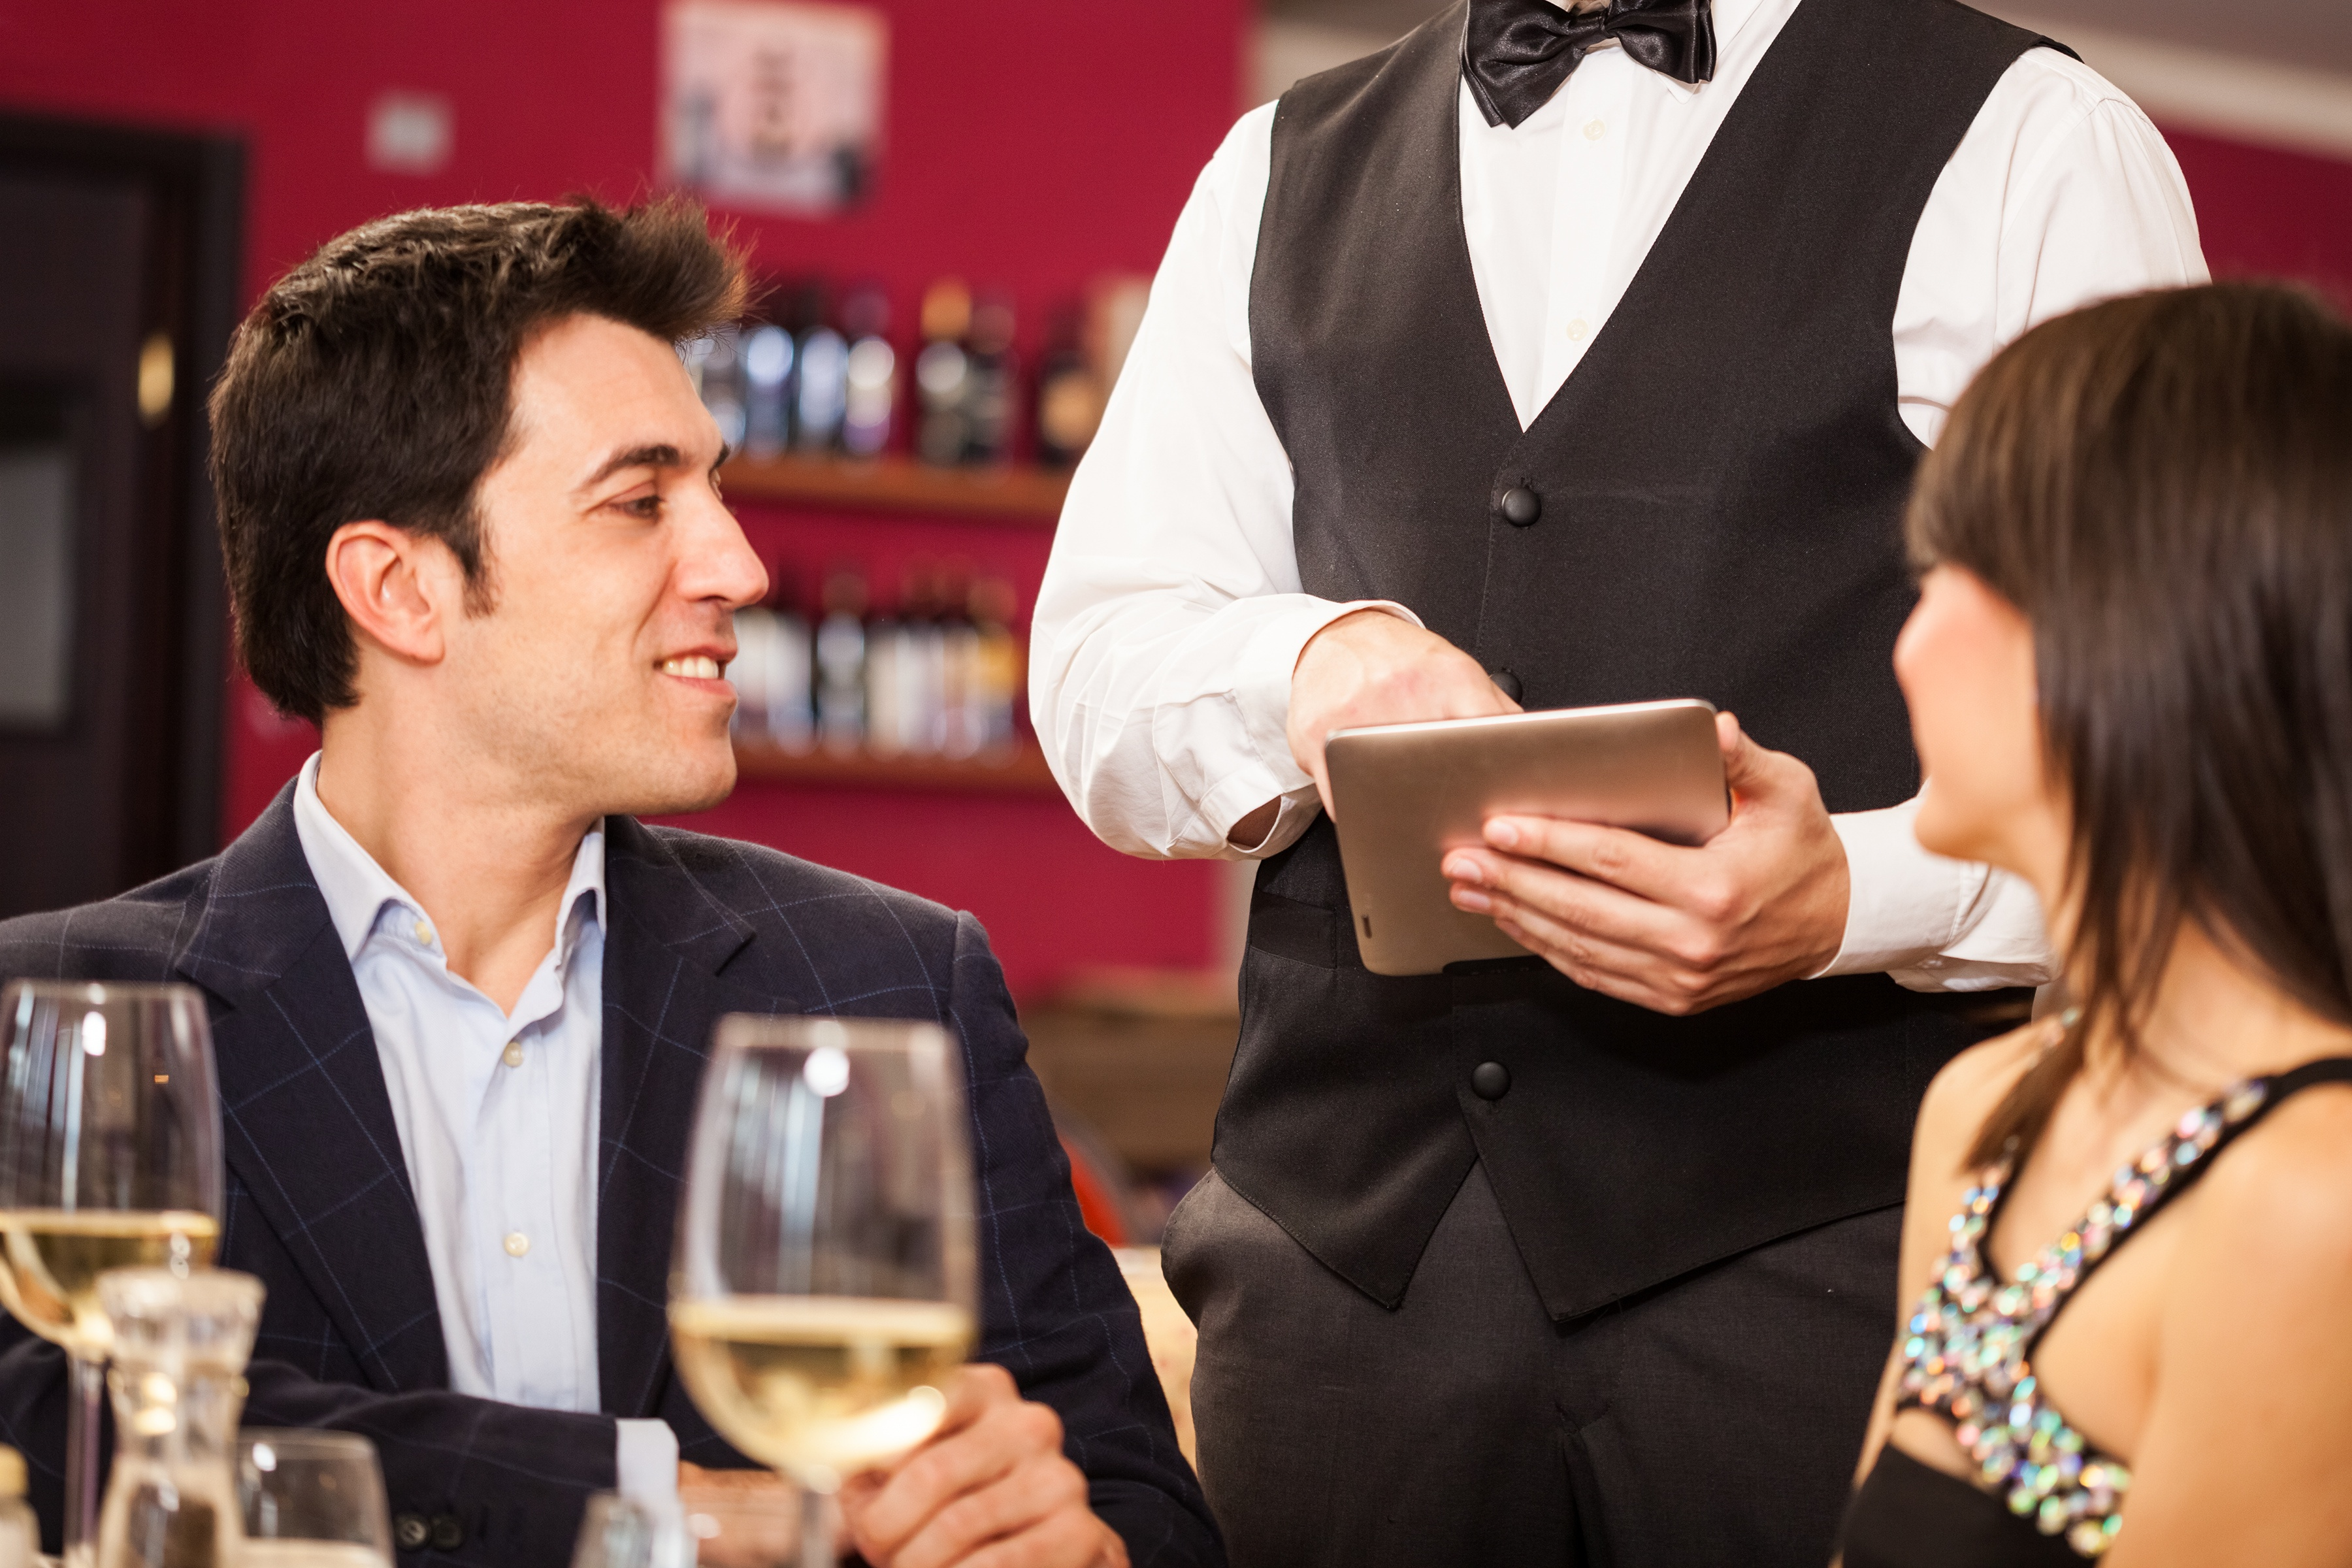 Mobile Ordering at Restaurant